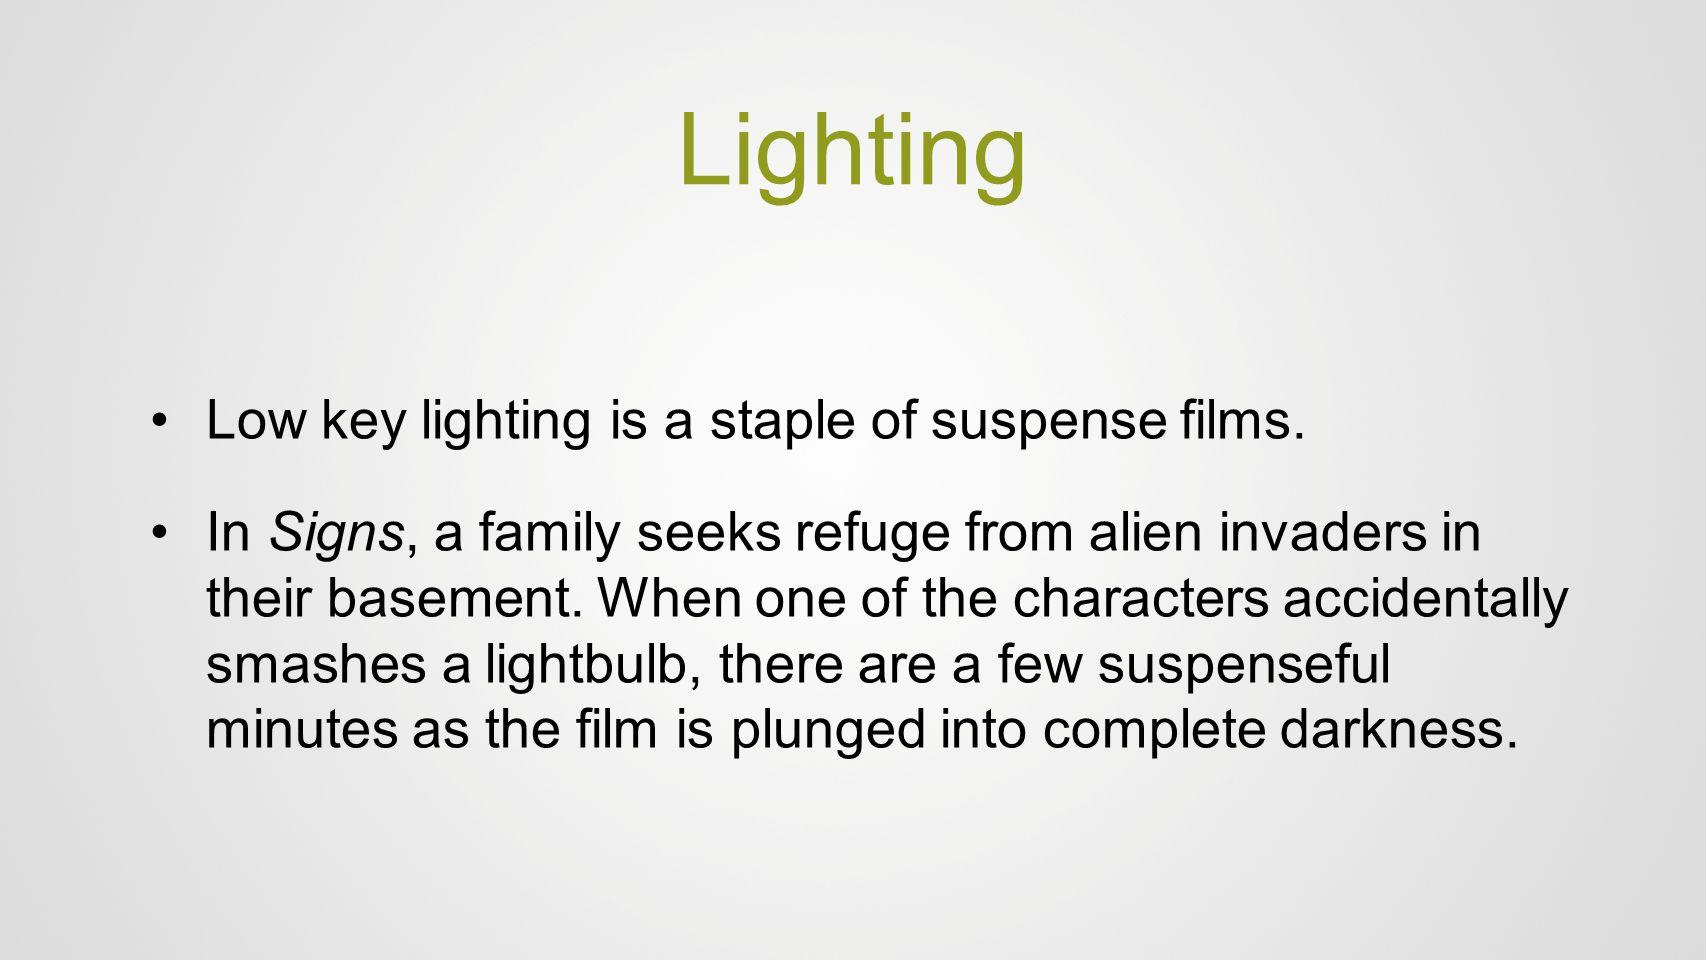 Lighting Low key lighting is a staple of suspense films.